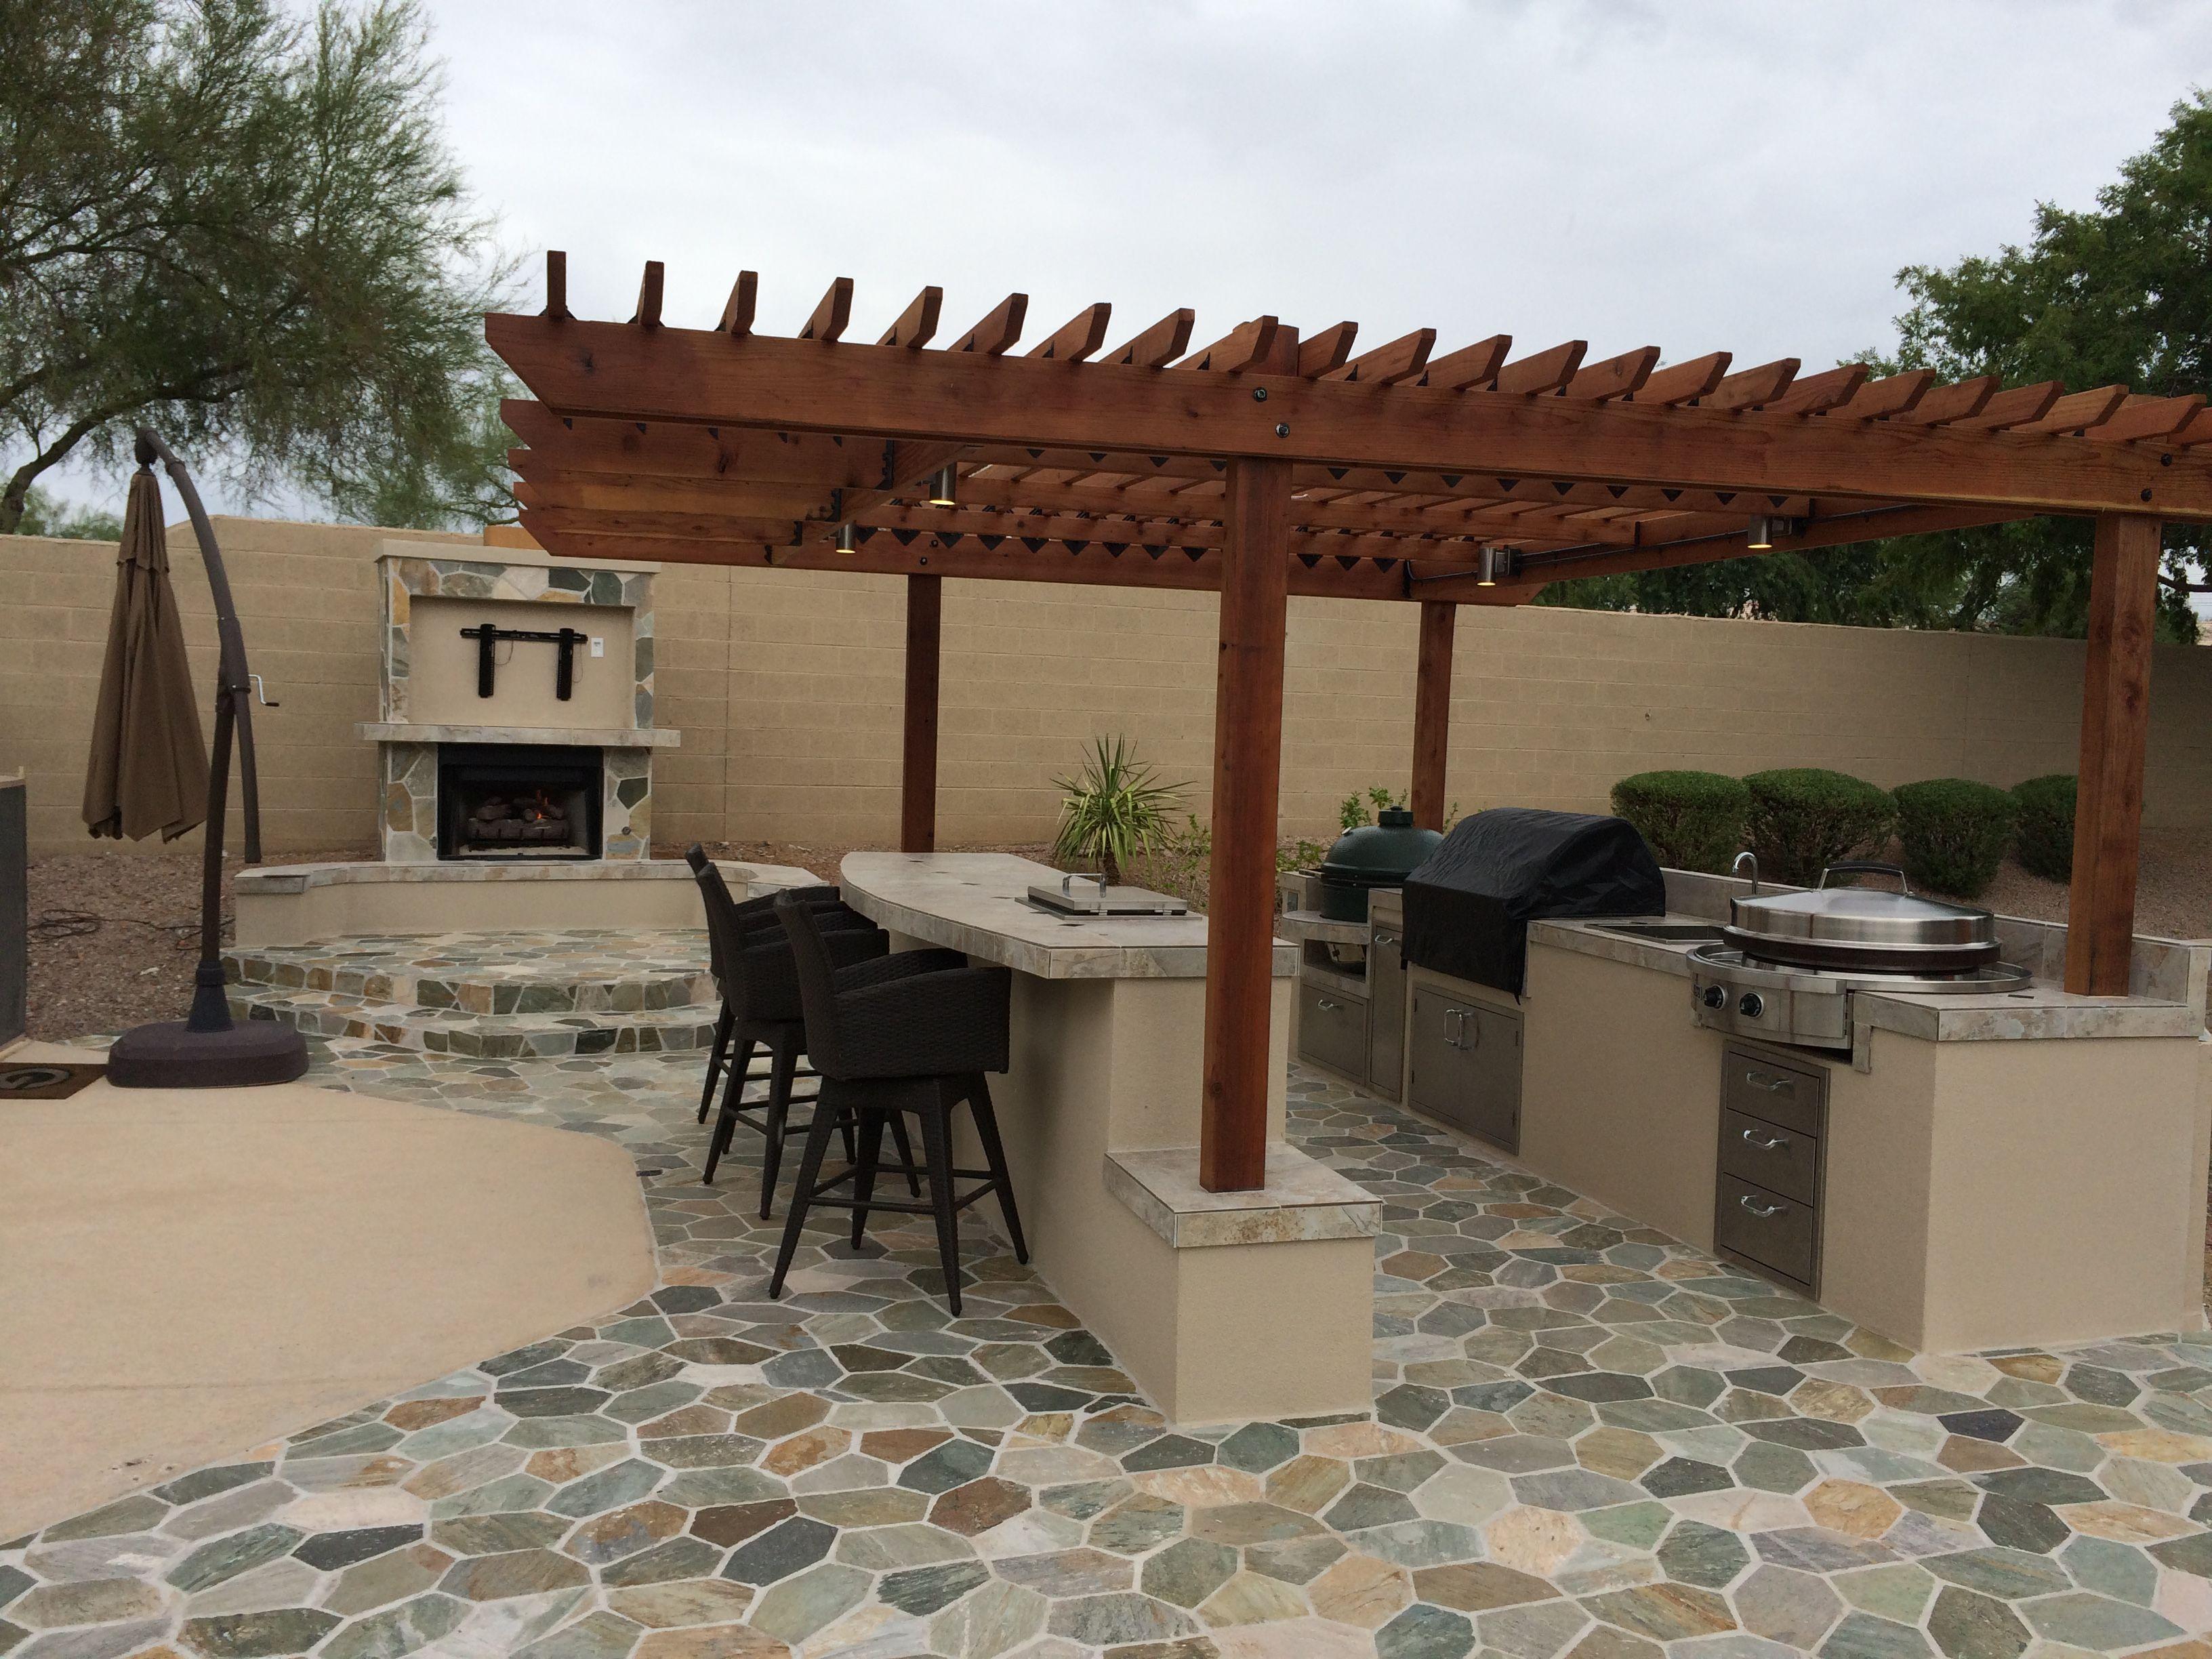 Arizona Outdoor Kitchens Www Jbbqislands Com Backyard Landscaping Designs Outdoor Kitchen Design Backyard Grilling Area